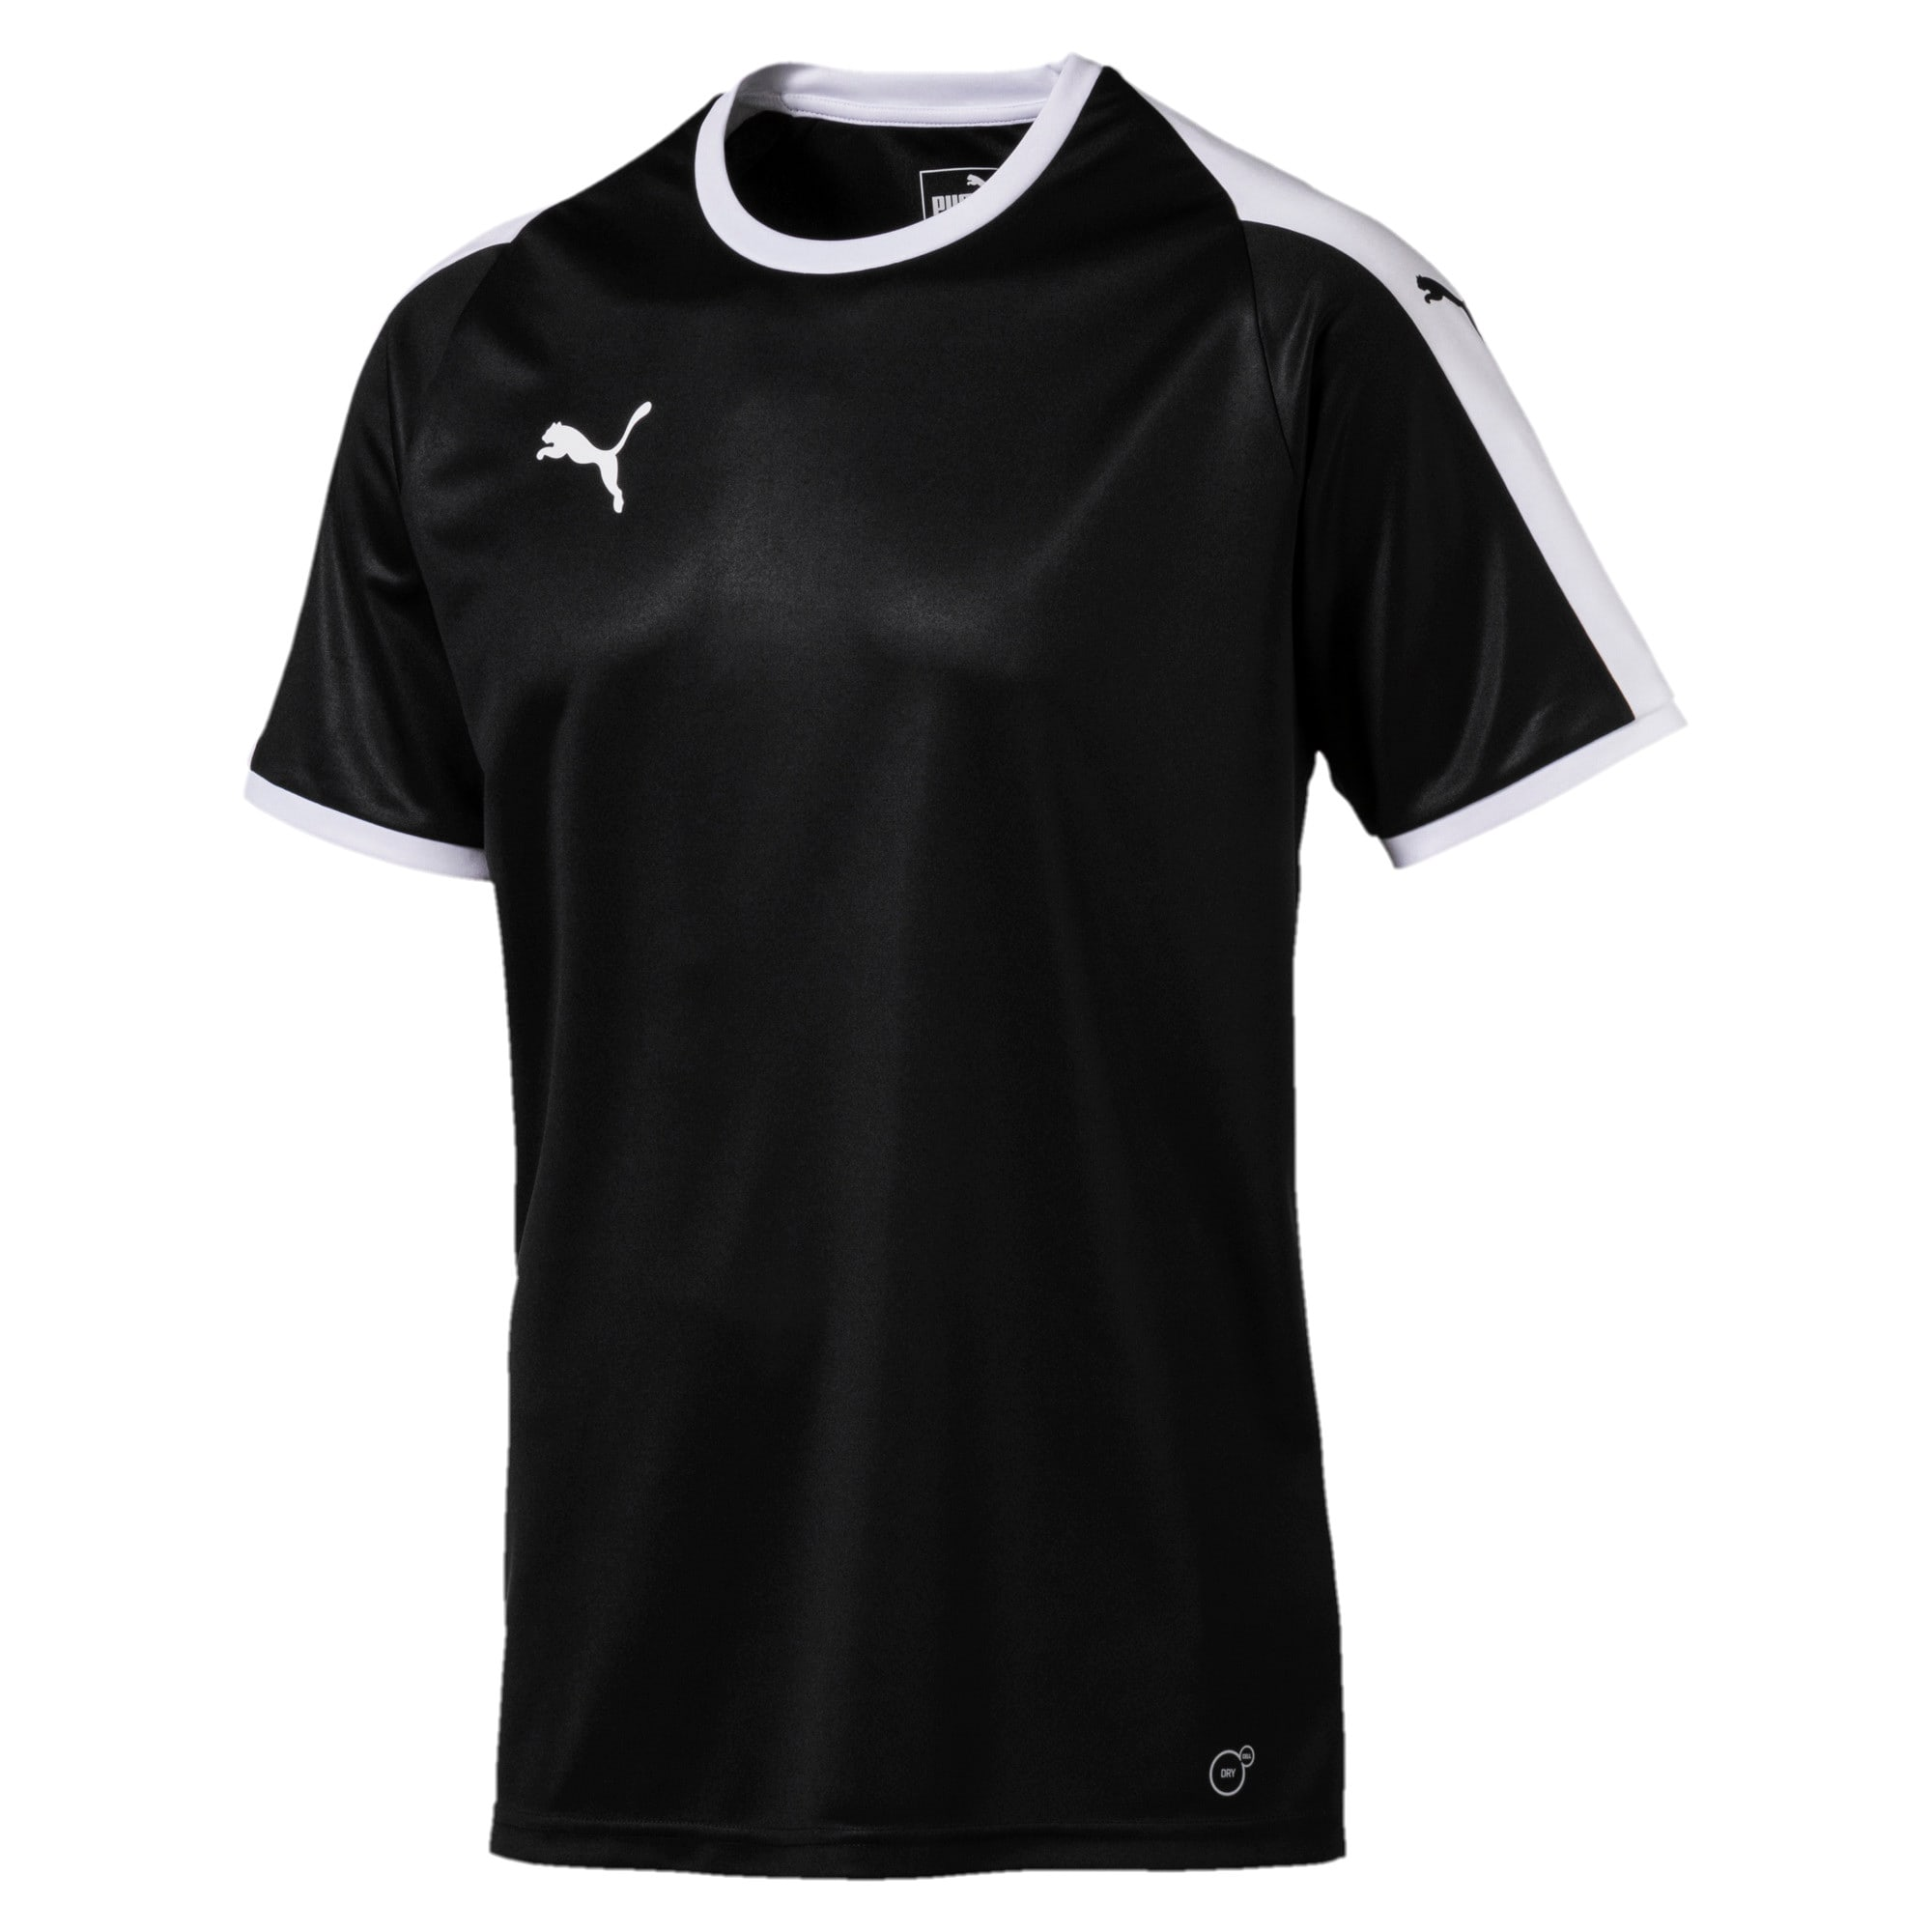 Thumbnail 4 of Liga shirt voor heren, Puma Black-Puma White, medium